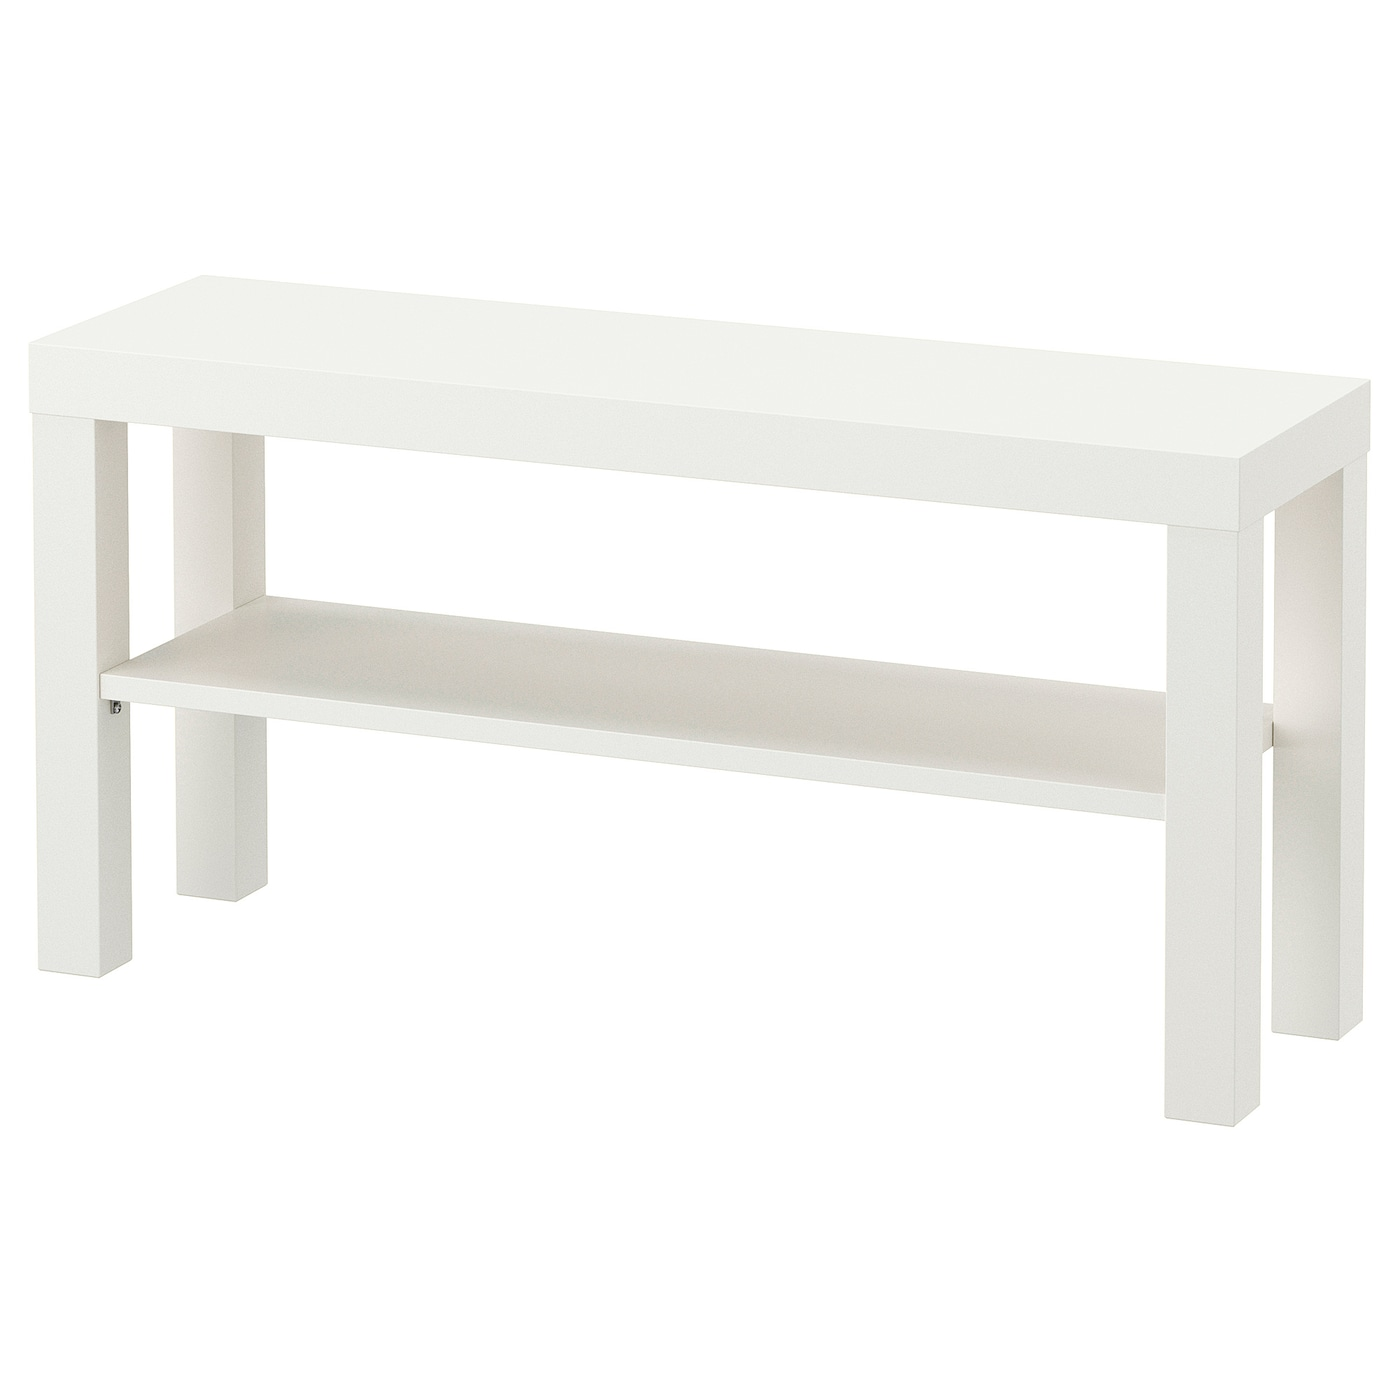 Lack mueble tv blanco 90 x 26 x 45 cm ikea - Ikea mesa lack blanca ...